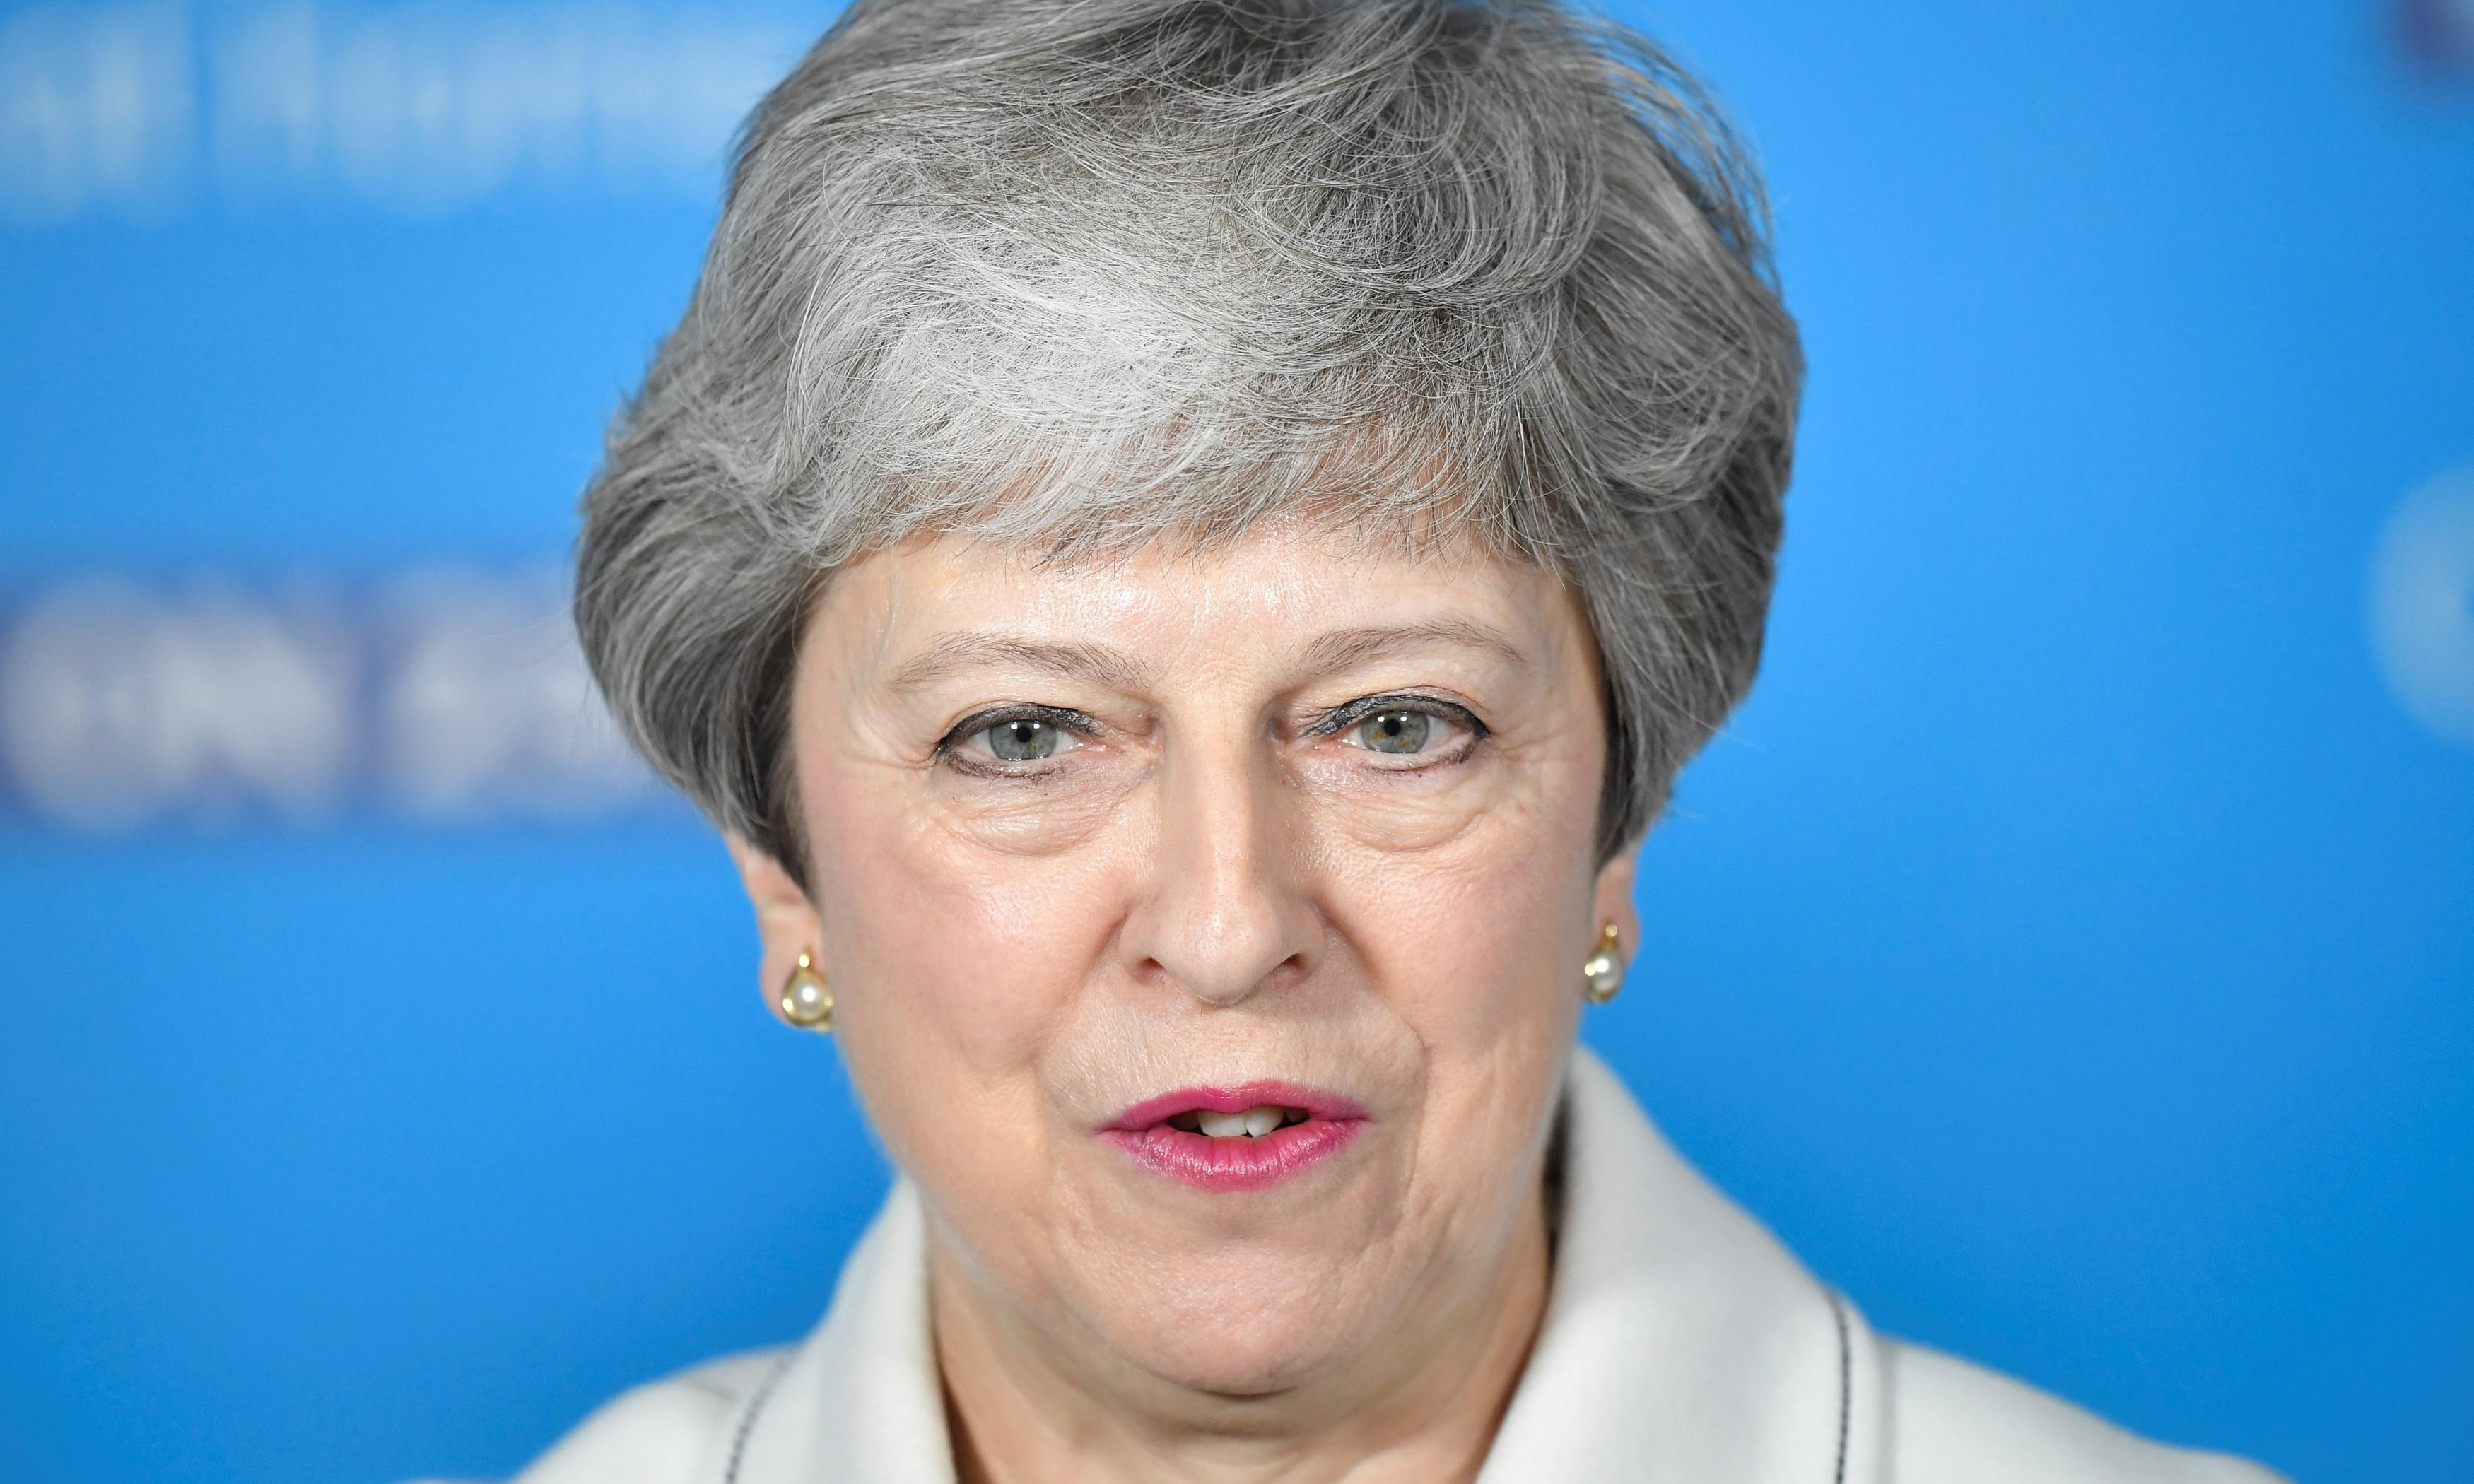 Senior Tories warn against extended leadership contest